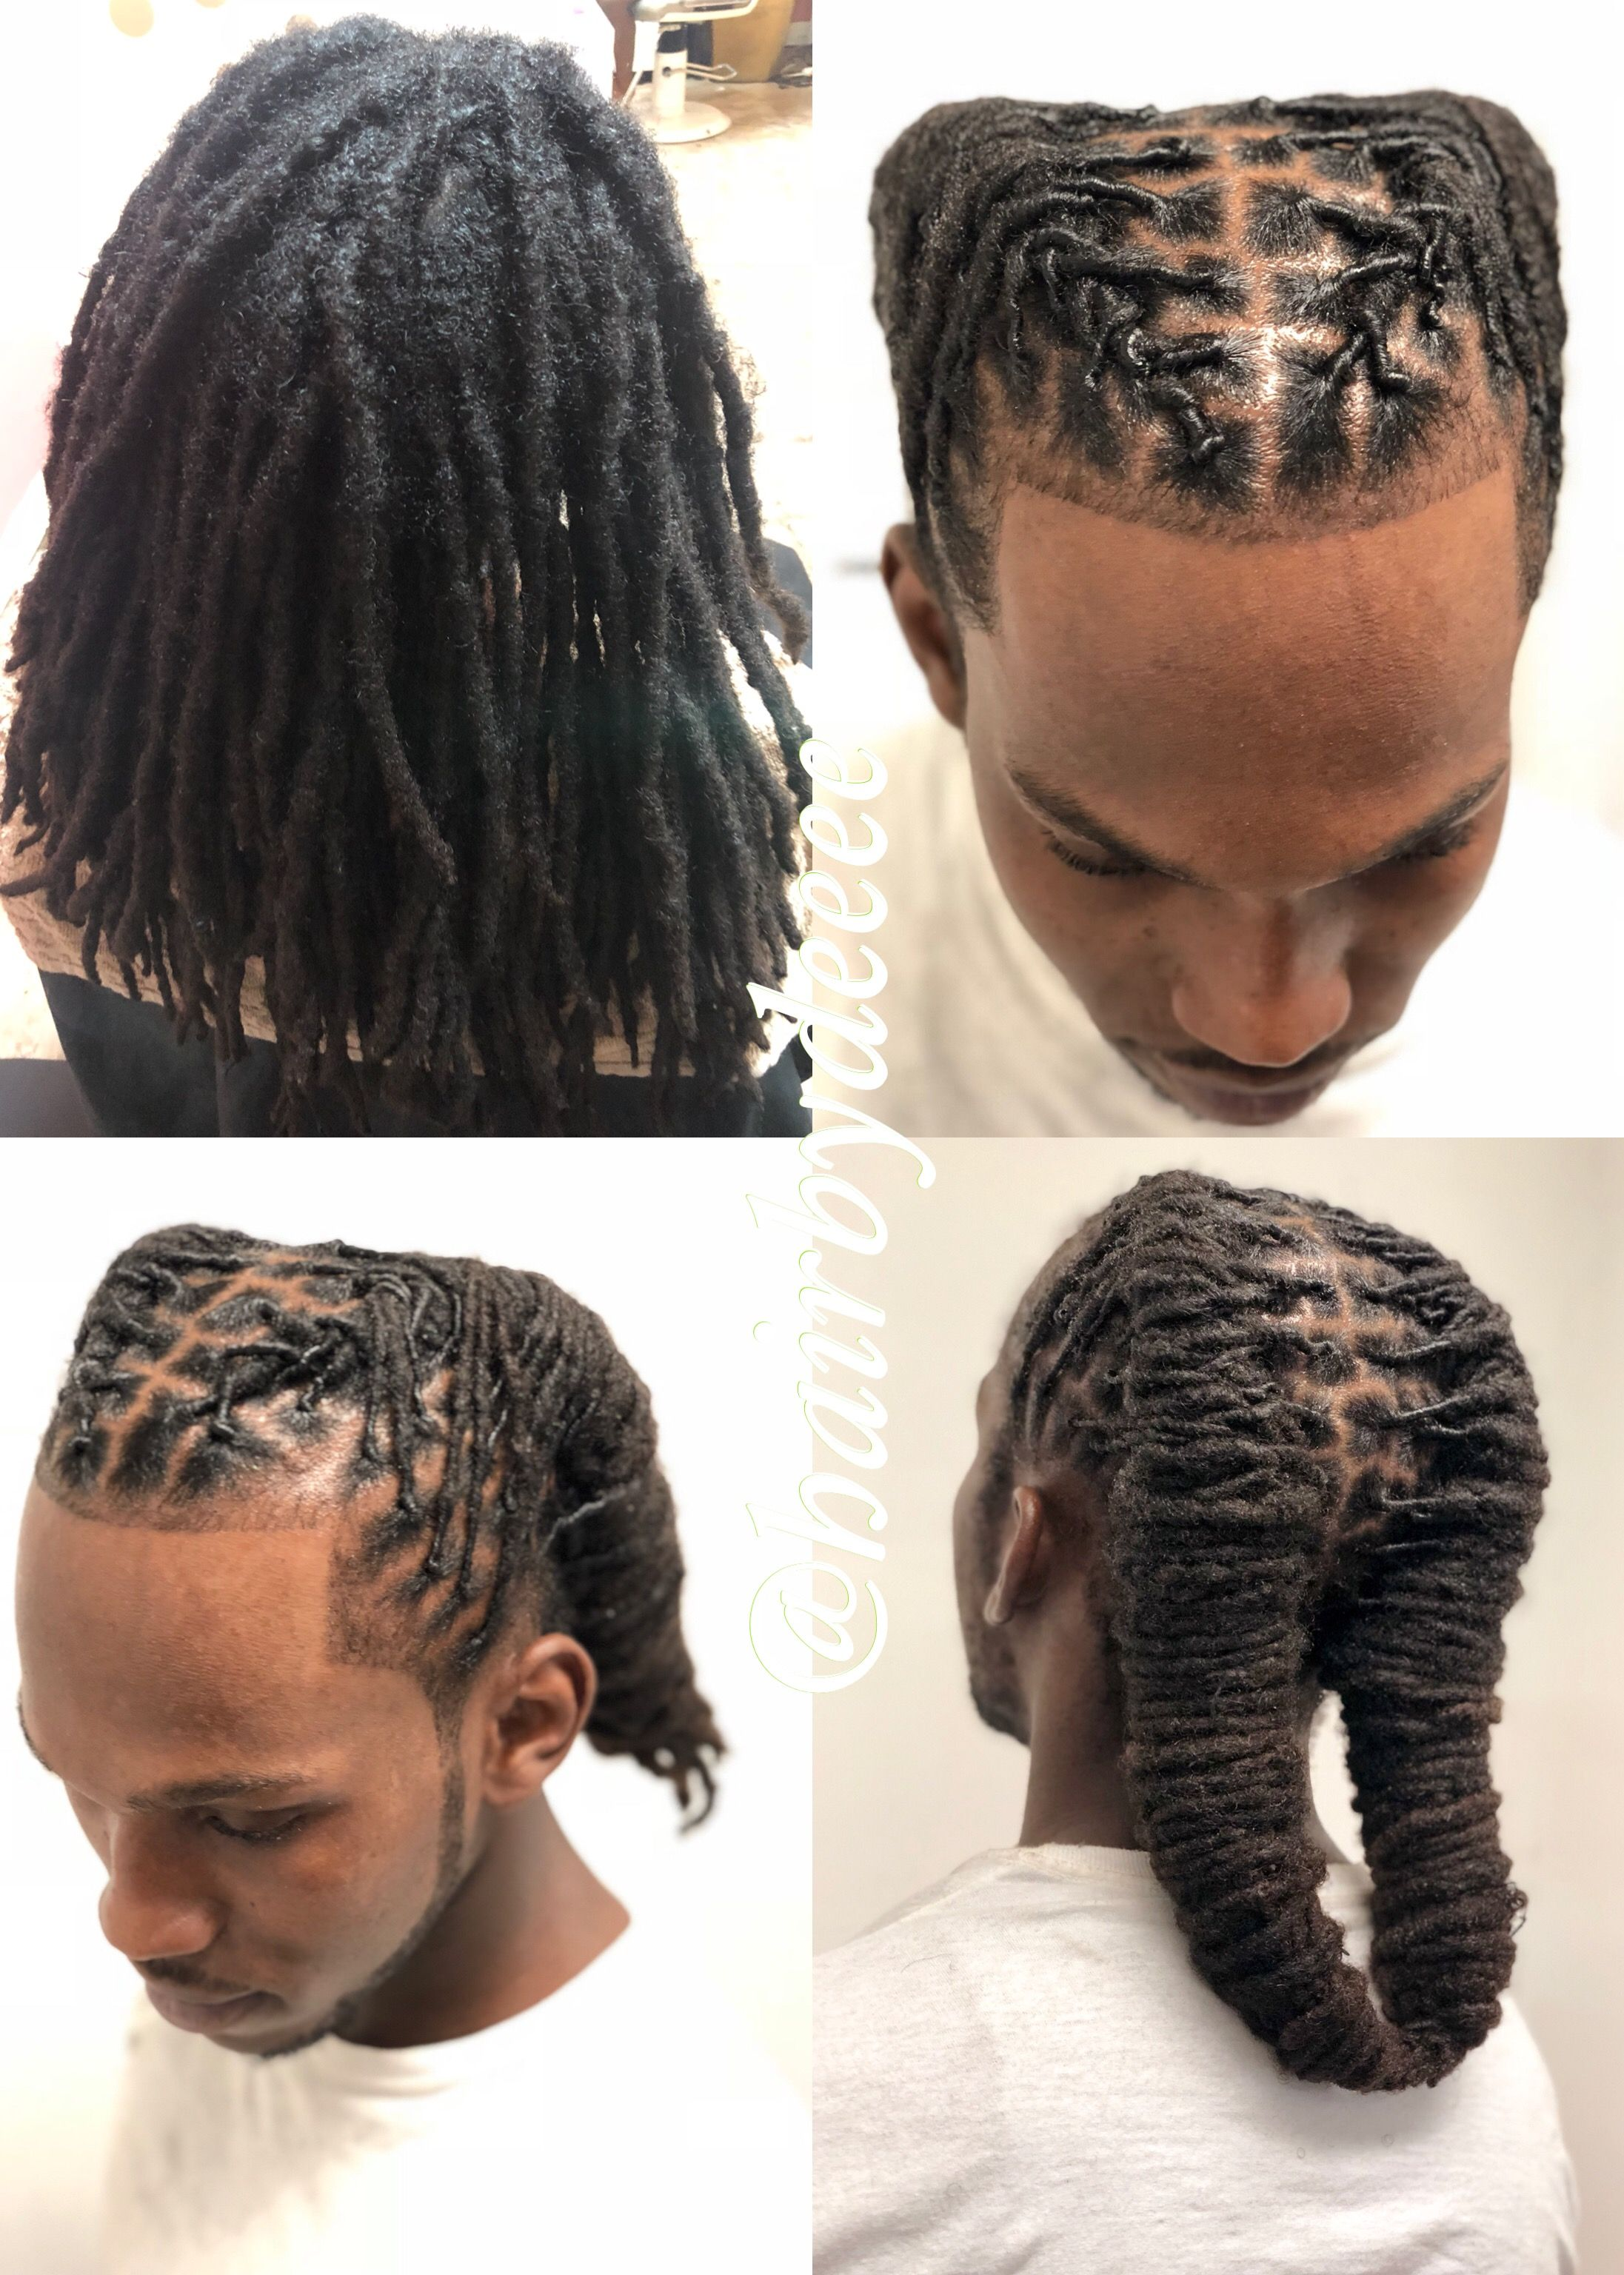 dreads styles for men | dreads style for men in 2019 | dread